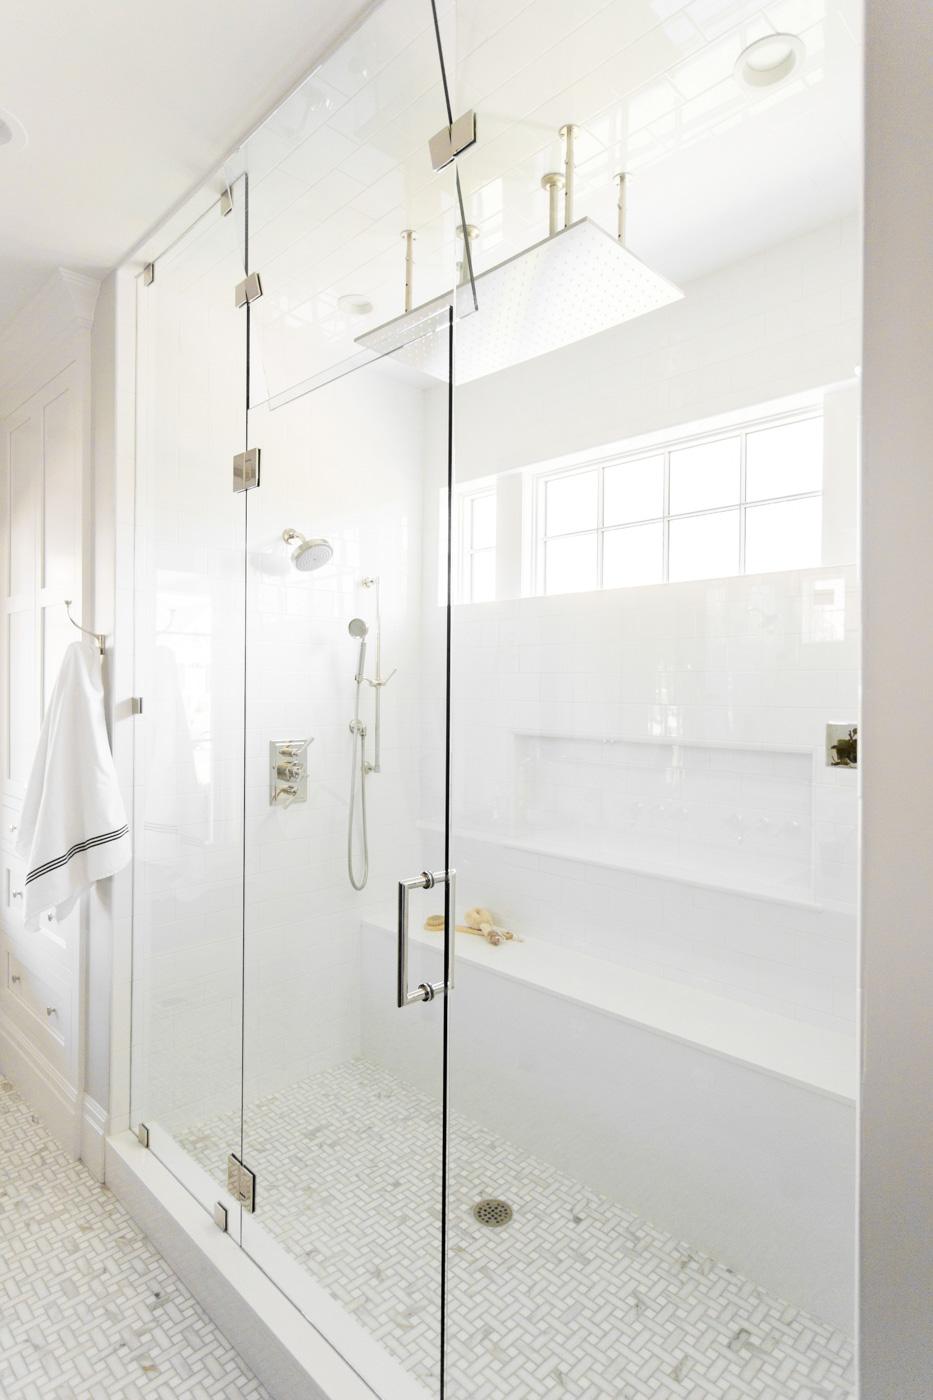 Large glass doors on bathroom shower